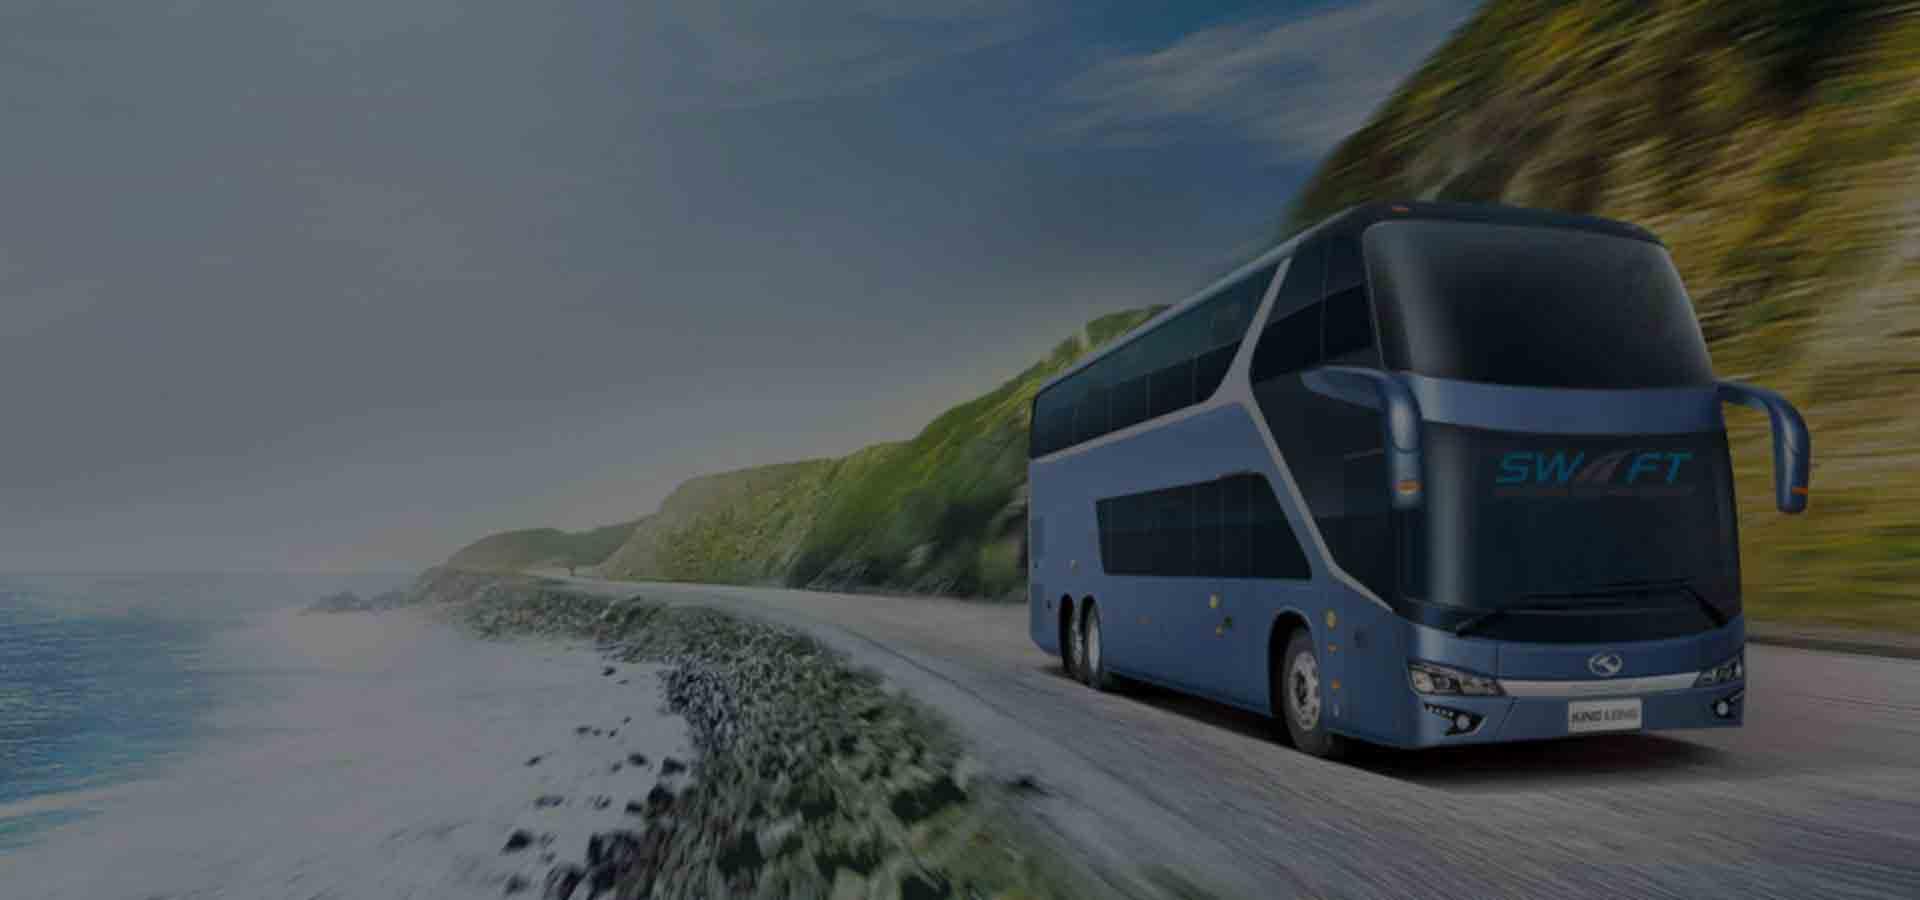 We Provide Best Bus Rental Solutions